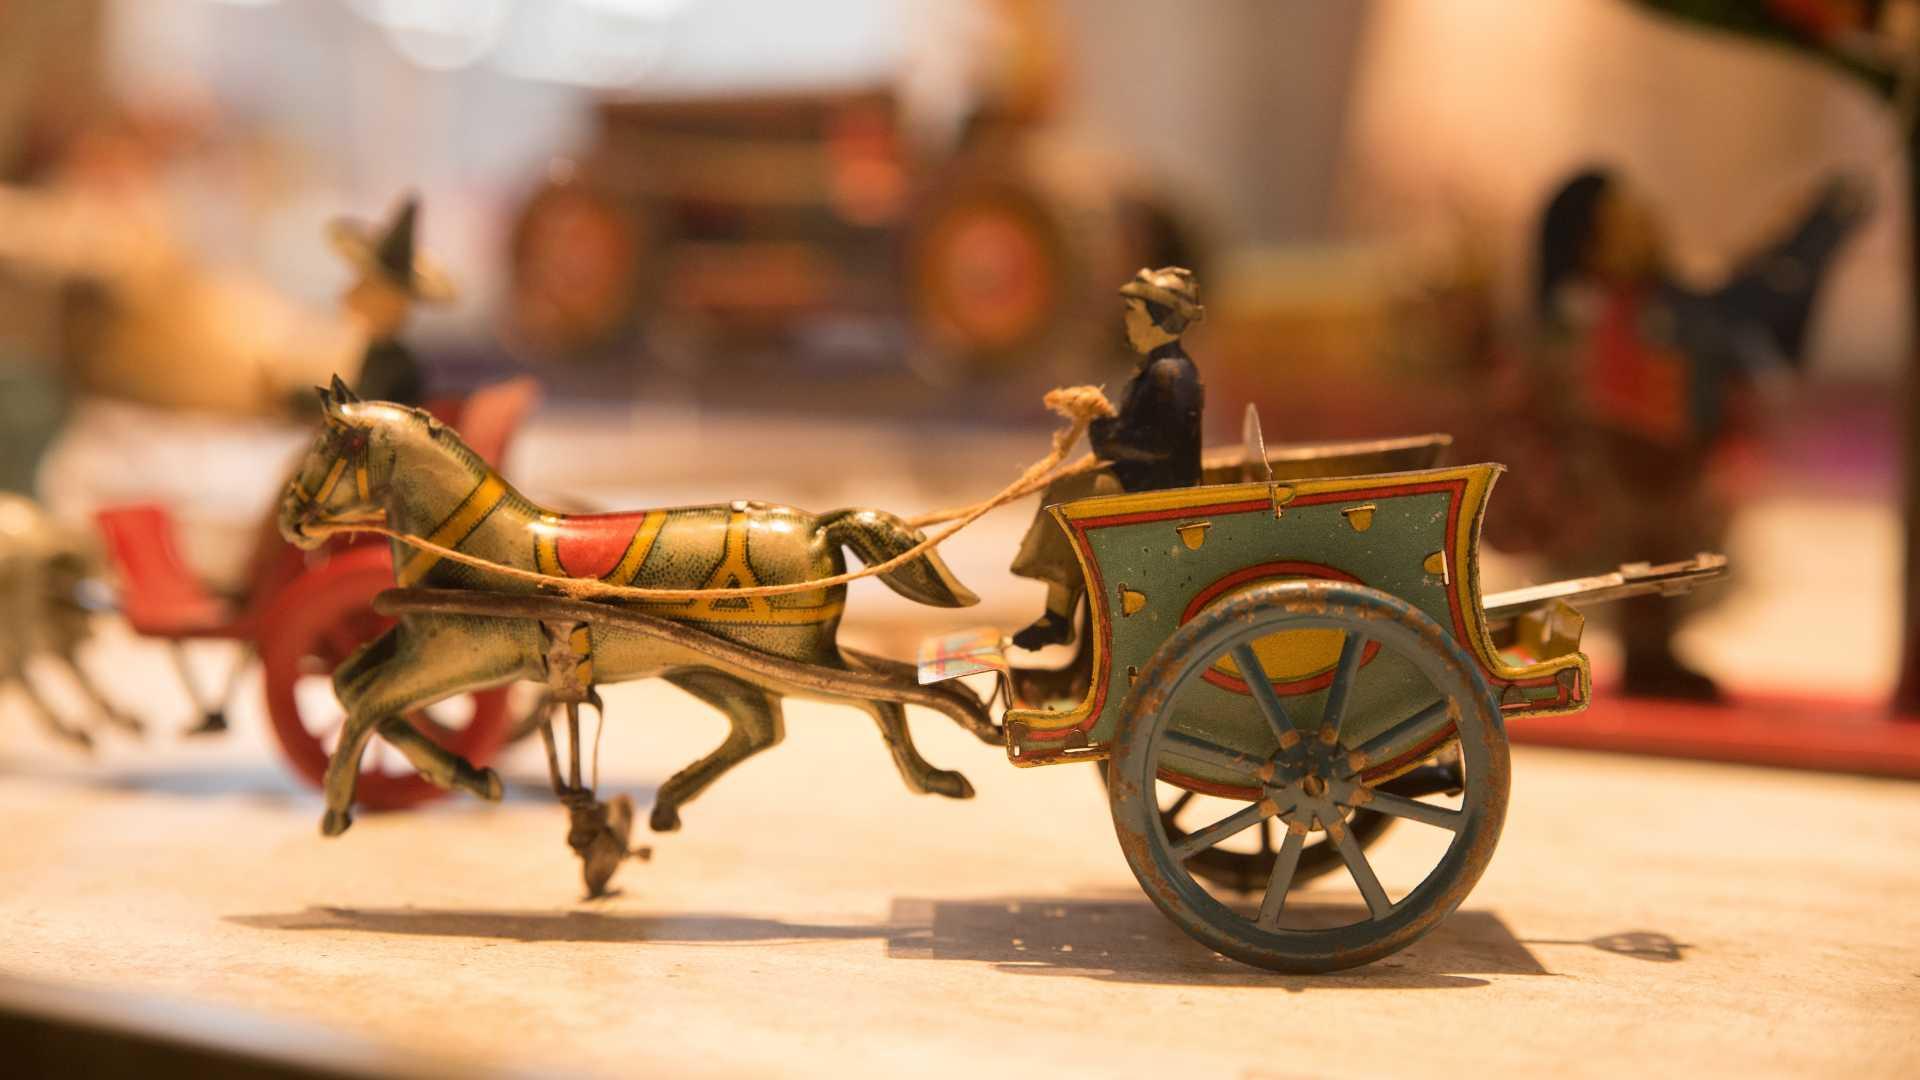 museo valenciano del juguete